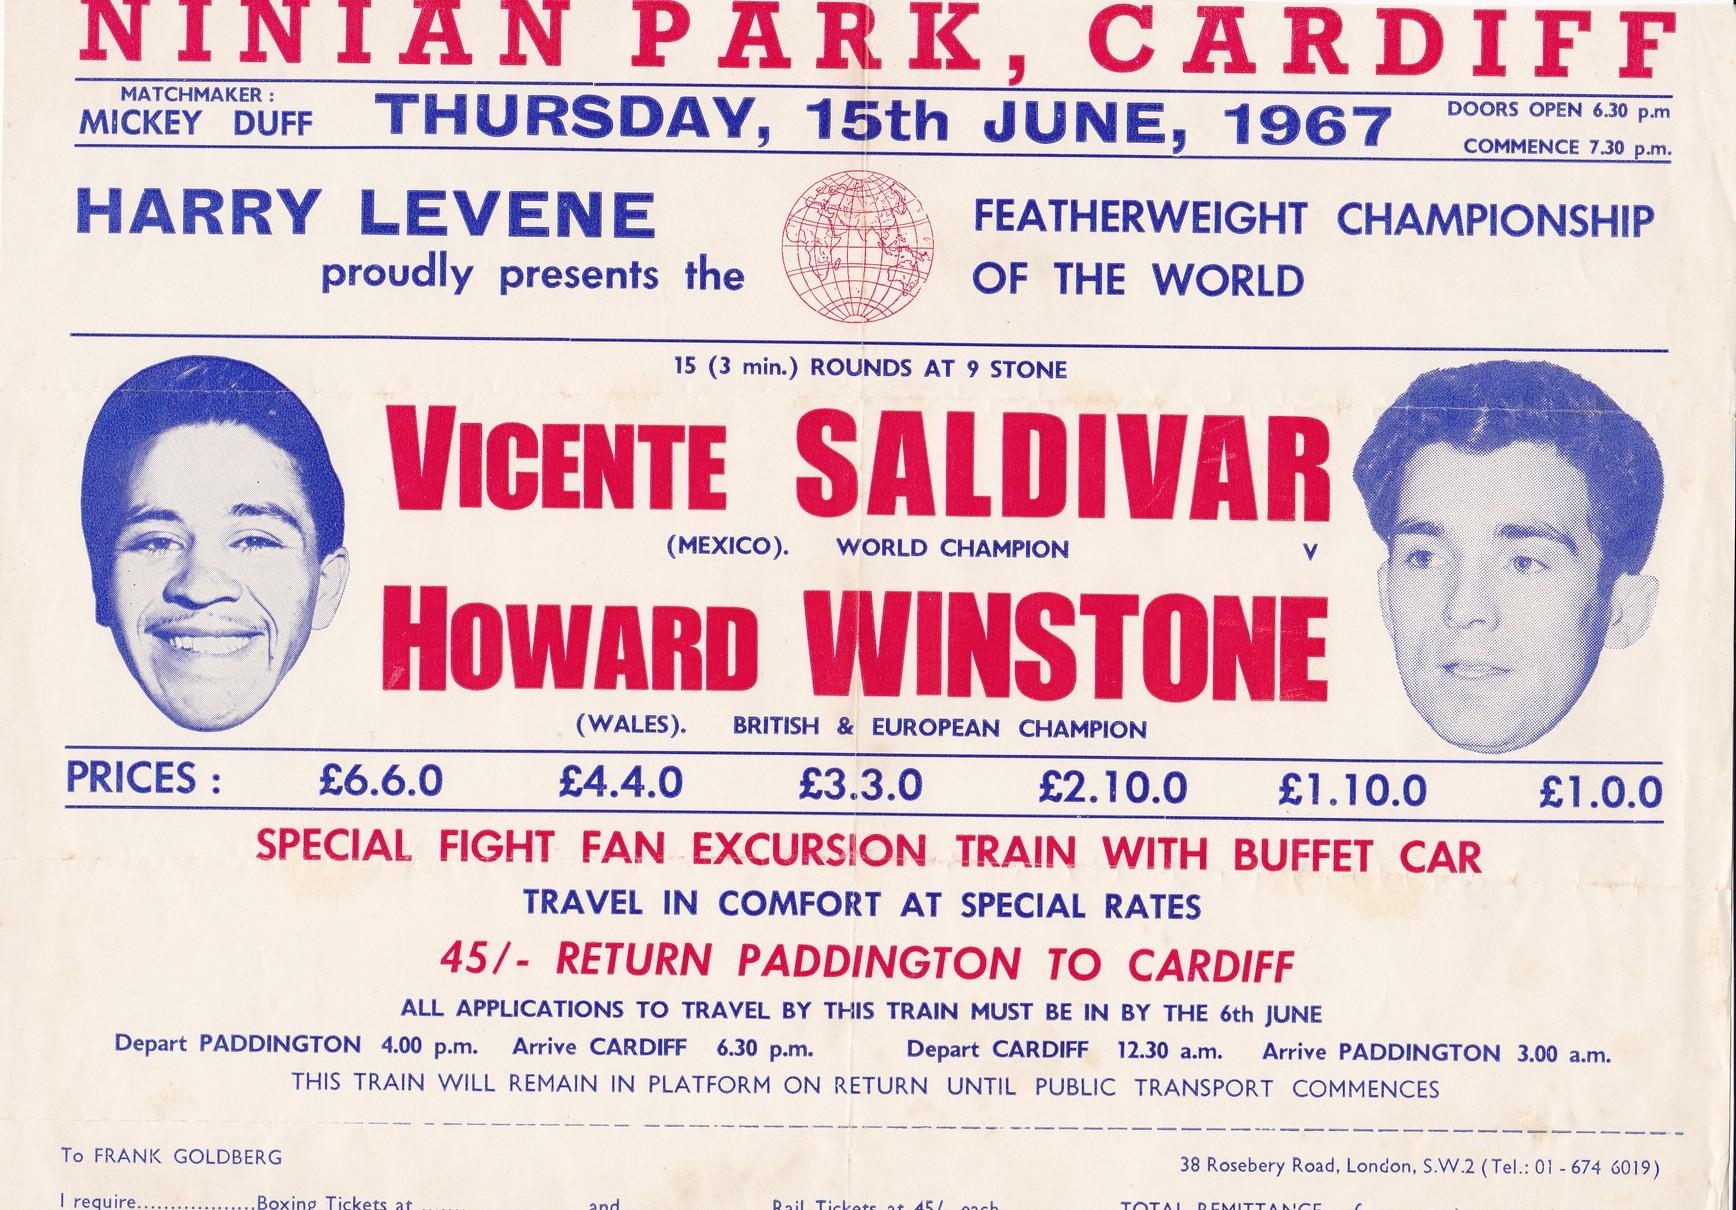 HOWARD-WINSTONE-VS-VICENTE-SALDIVAR-POSTER